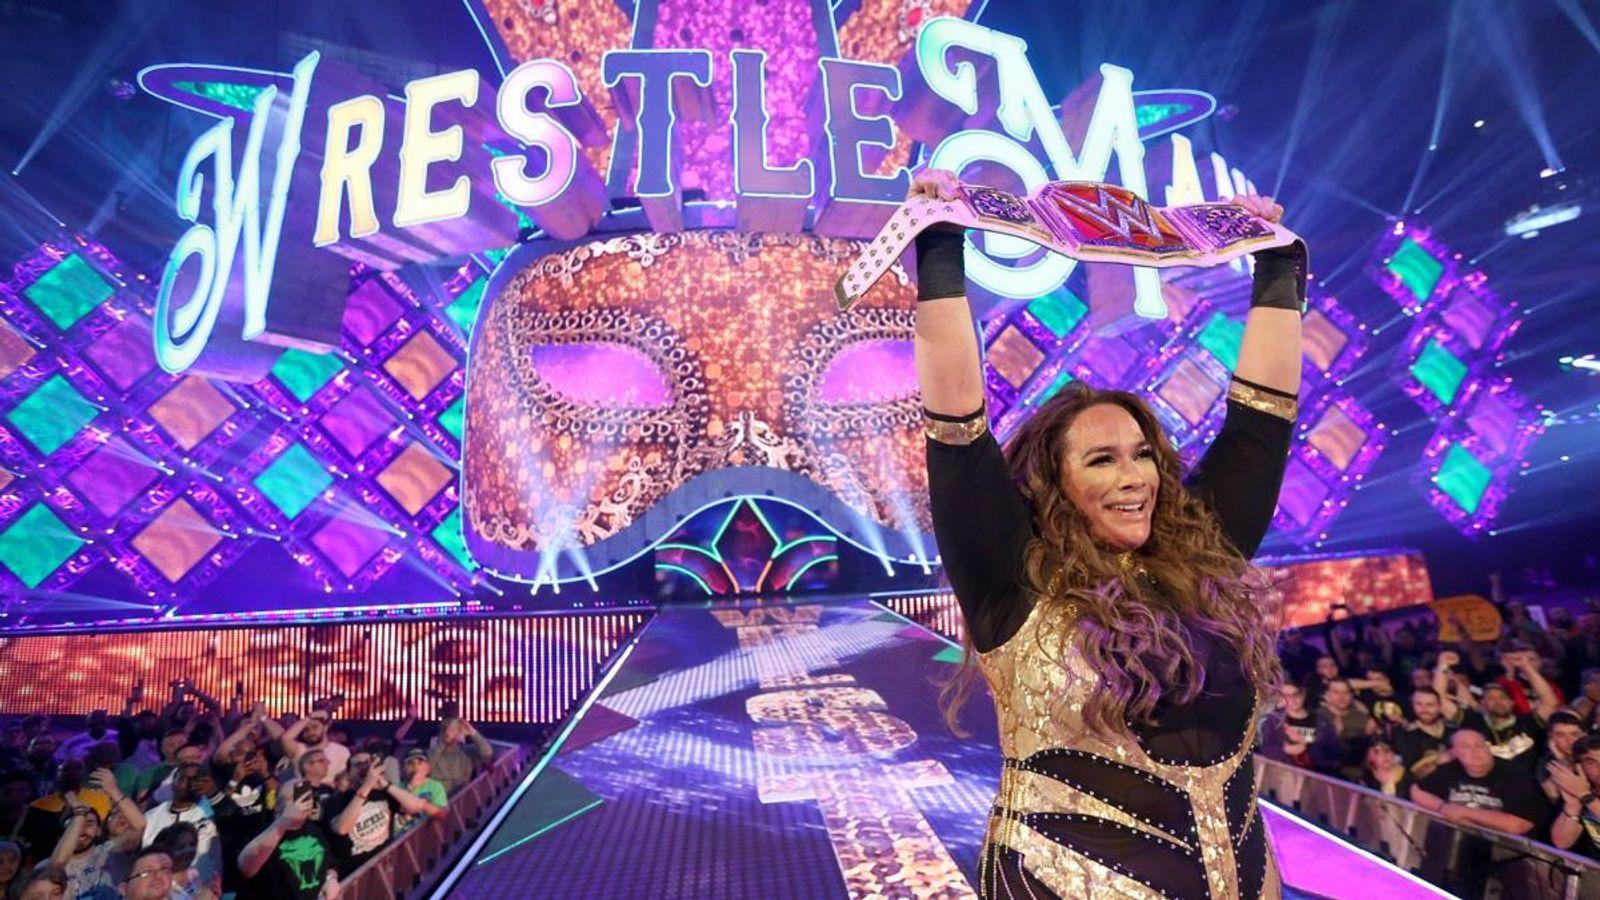 Sky Wrestlemania 34